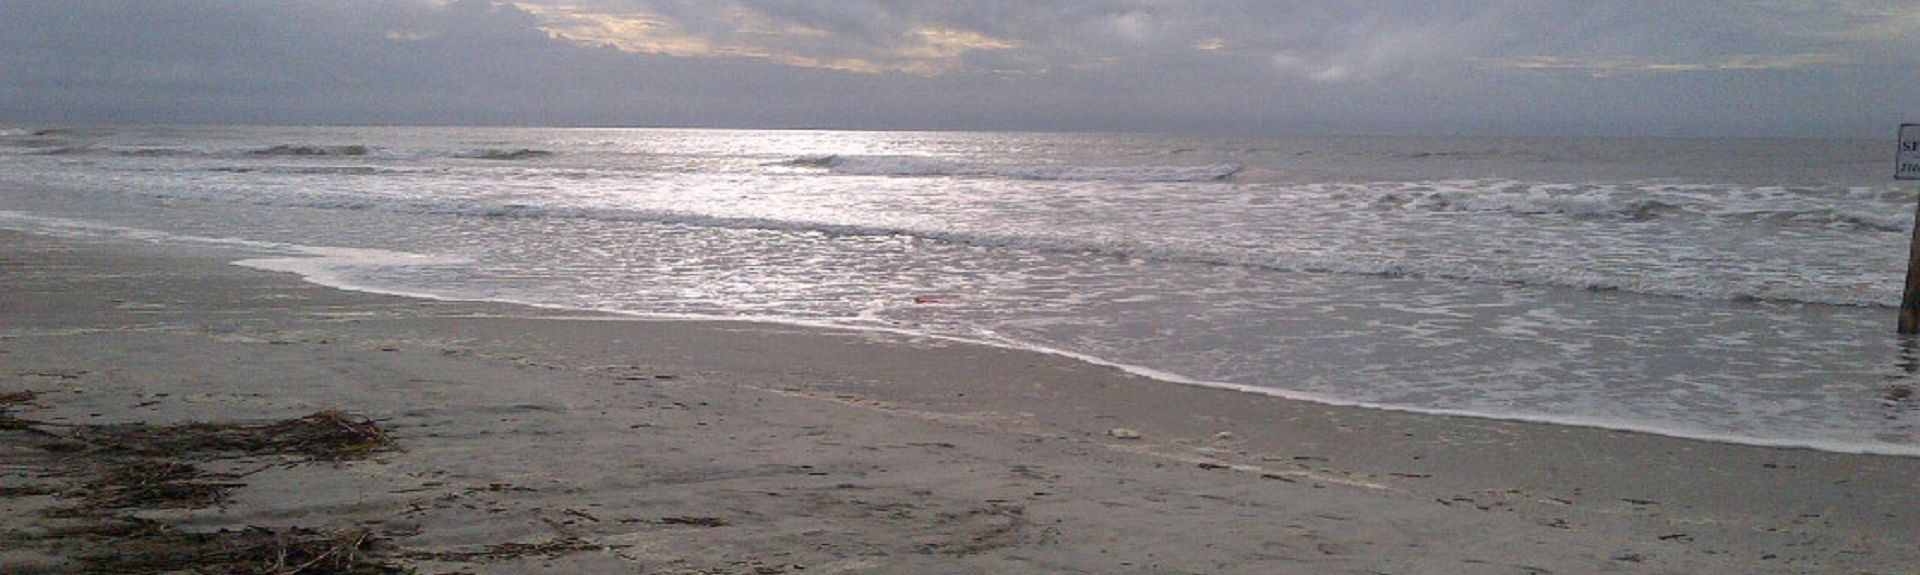 Champions Villa, Sea Trail Golf Resort, Sunset Beach, NC, USA